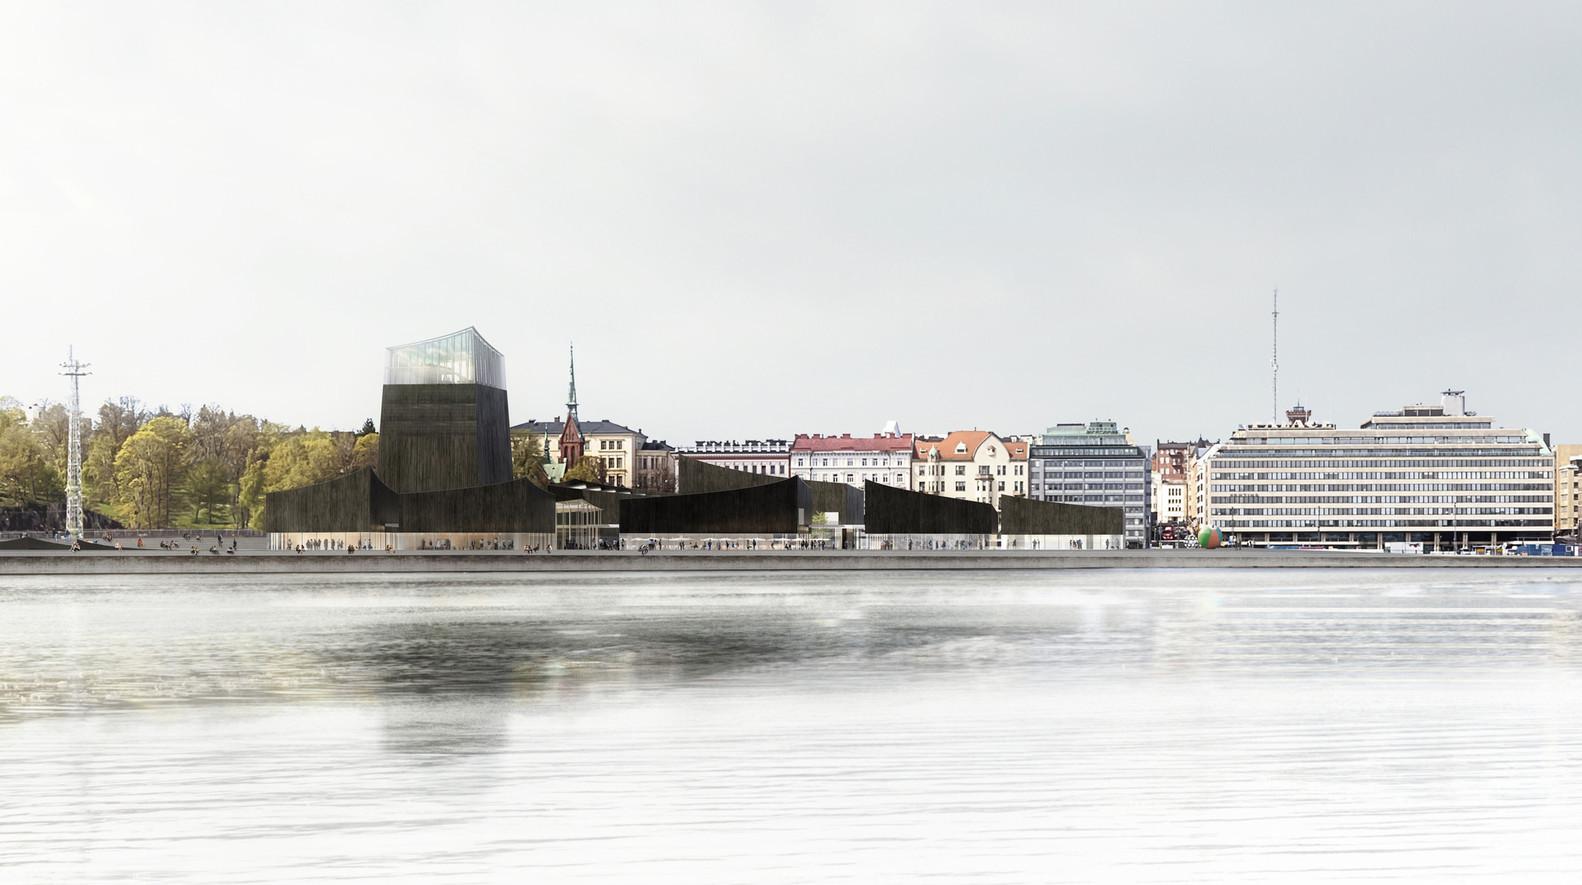 Helsinki hook up 2014 Live Stream livingsocial Raleigh speed dating